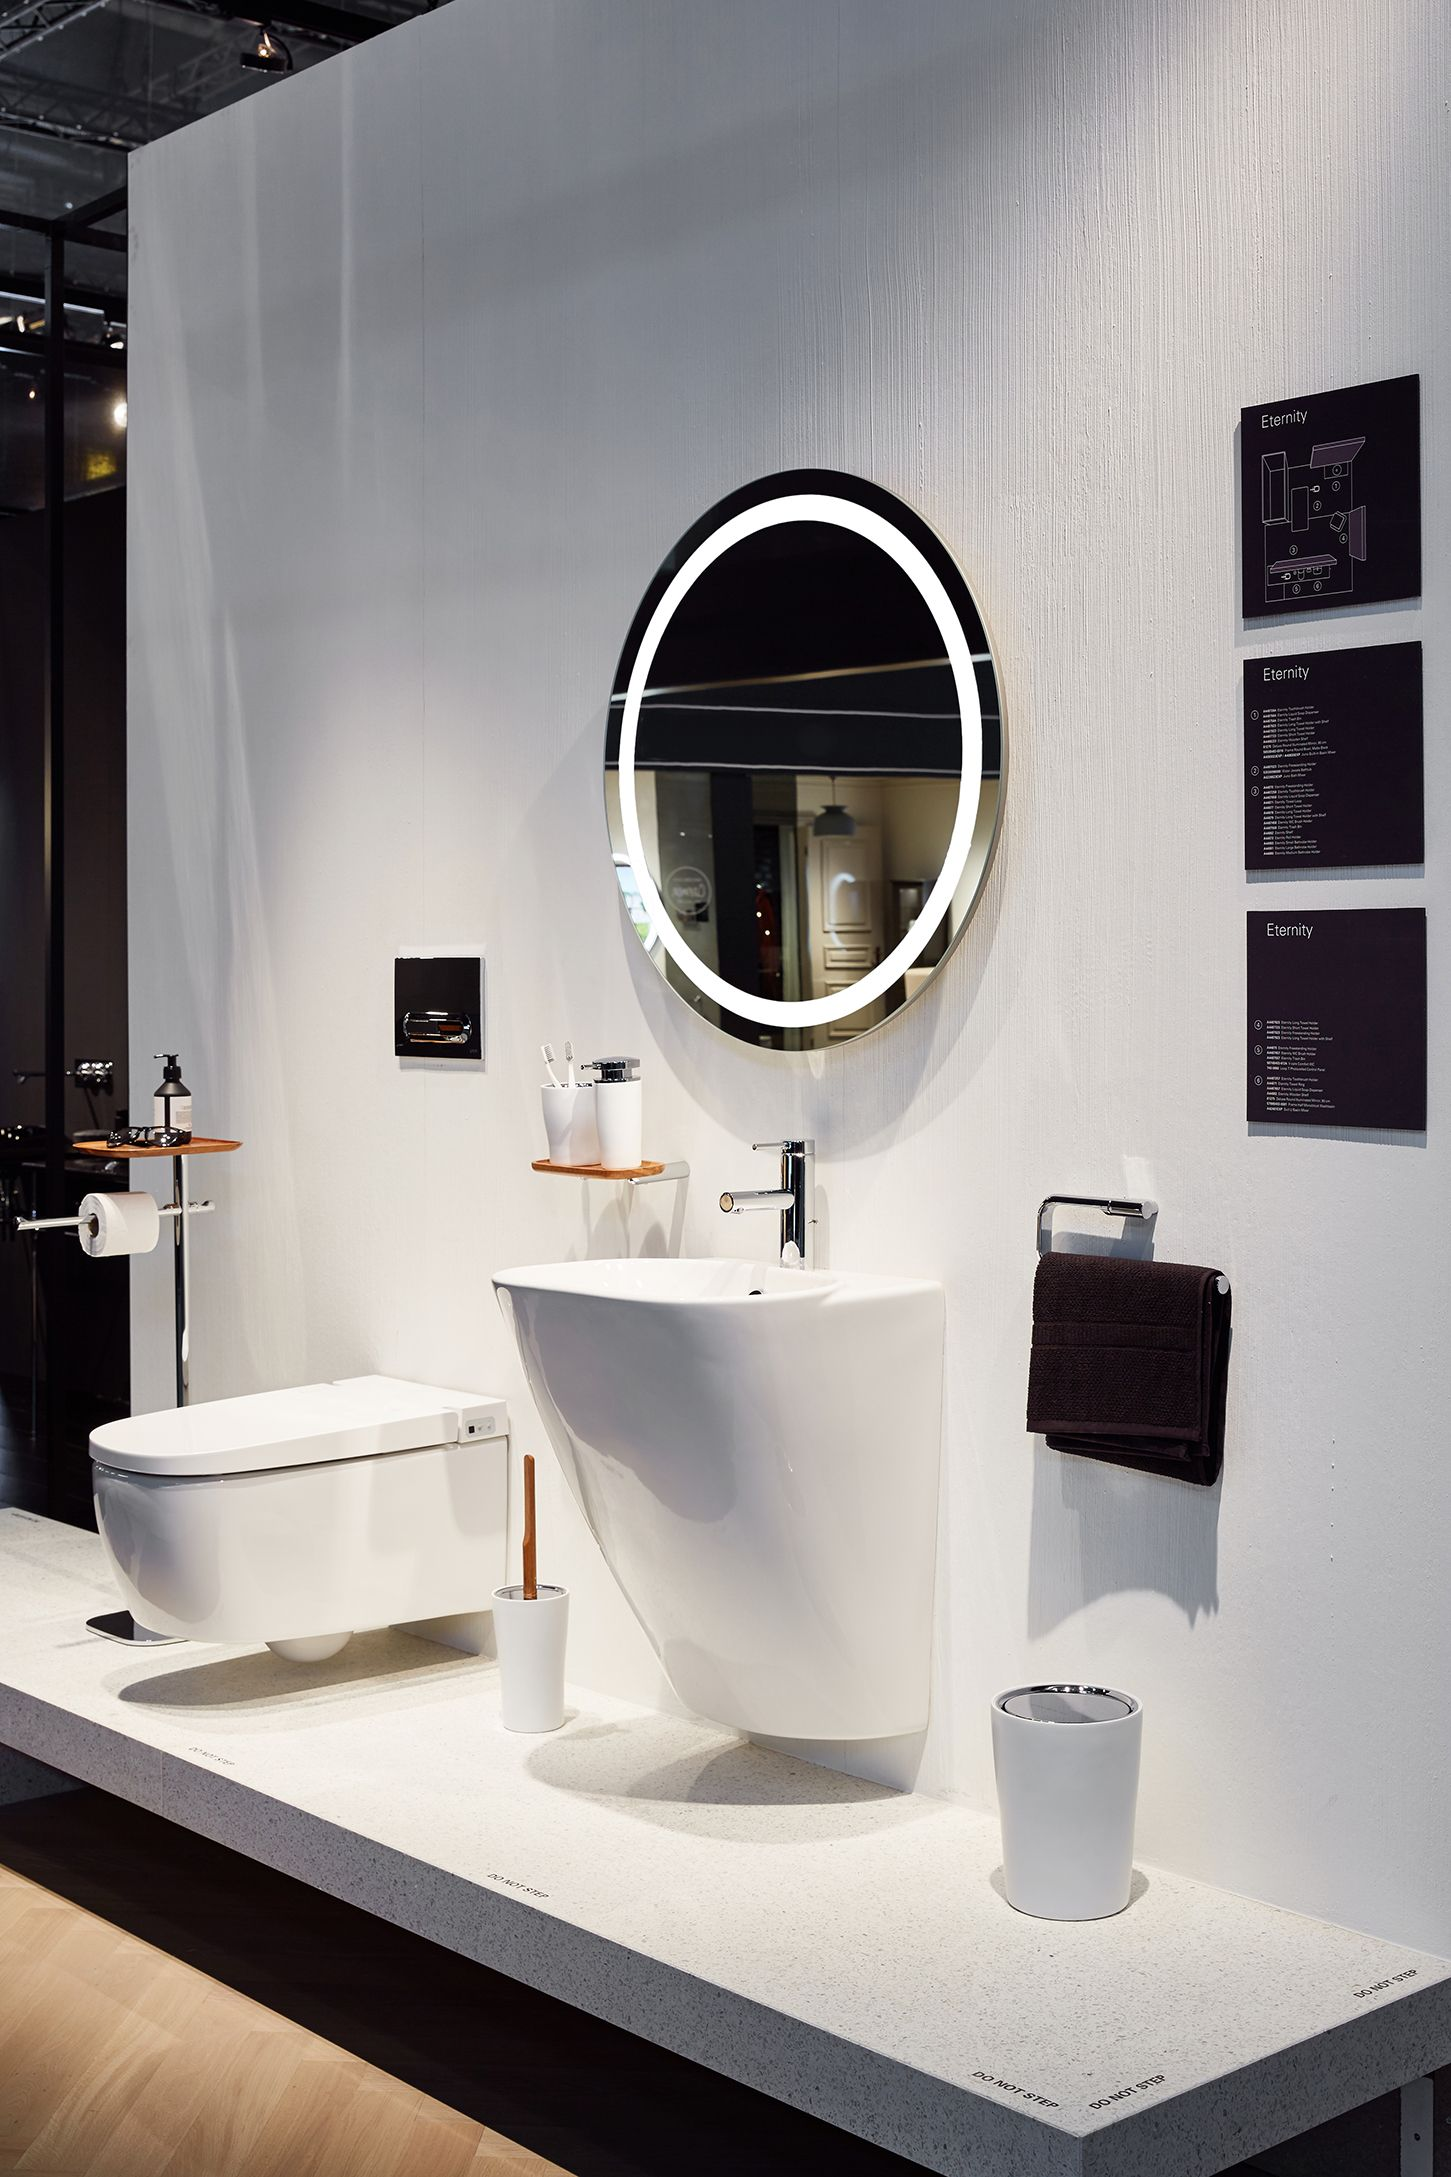 Vitra Ish Frankfurt 2017 Bathroom Showrooms Stylish Bathroom Bathroom Interior Design